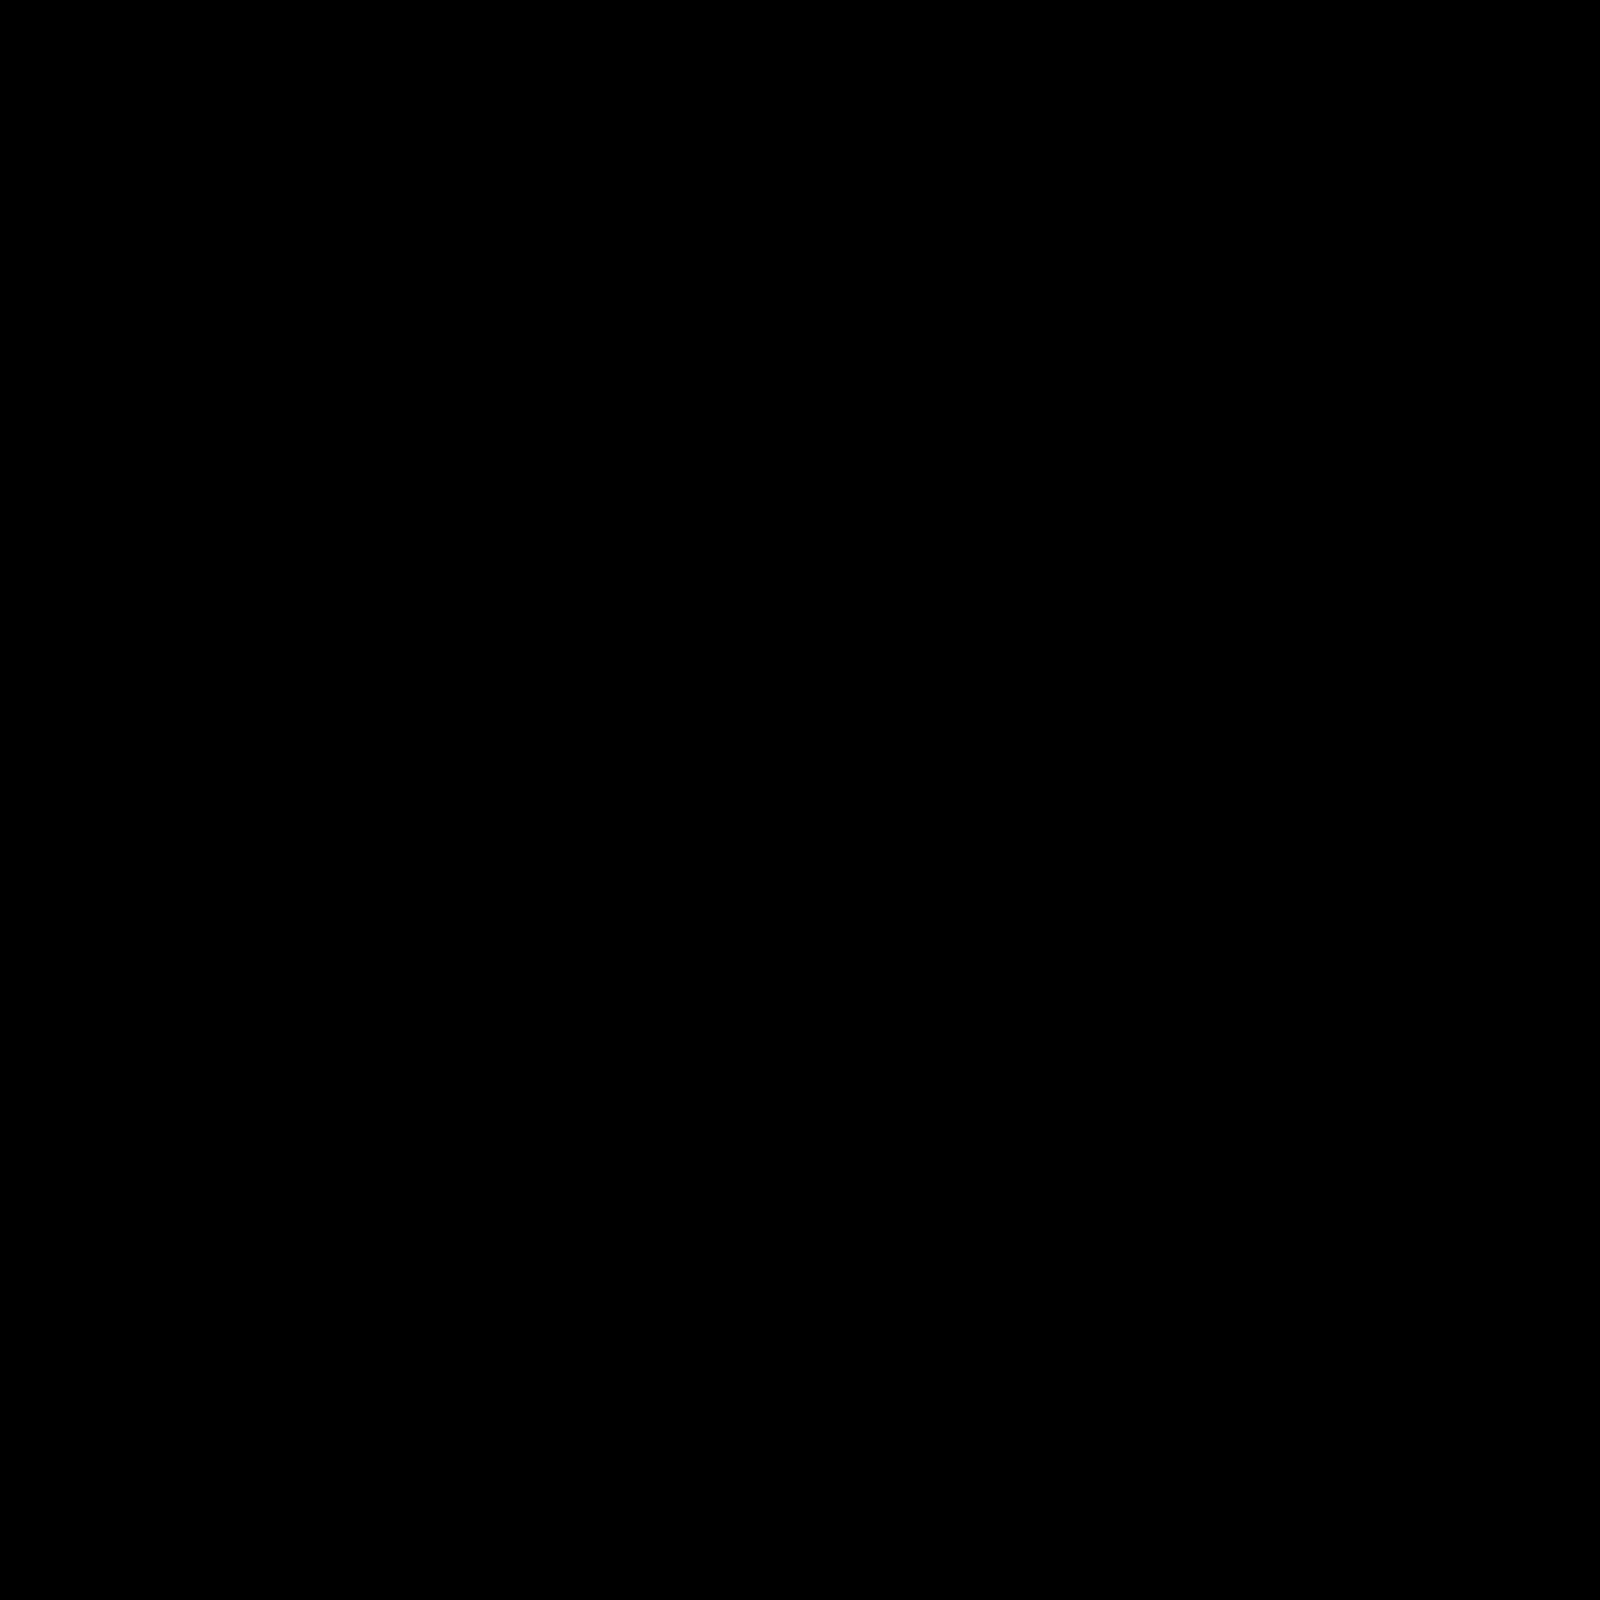 Automatic Car Wash icon